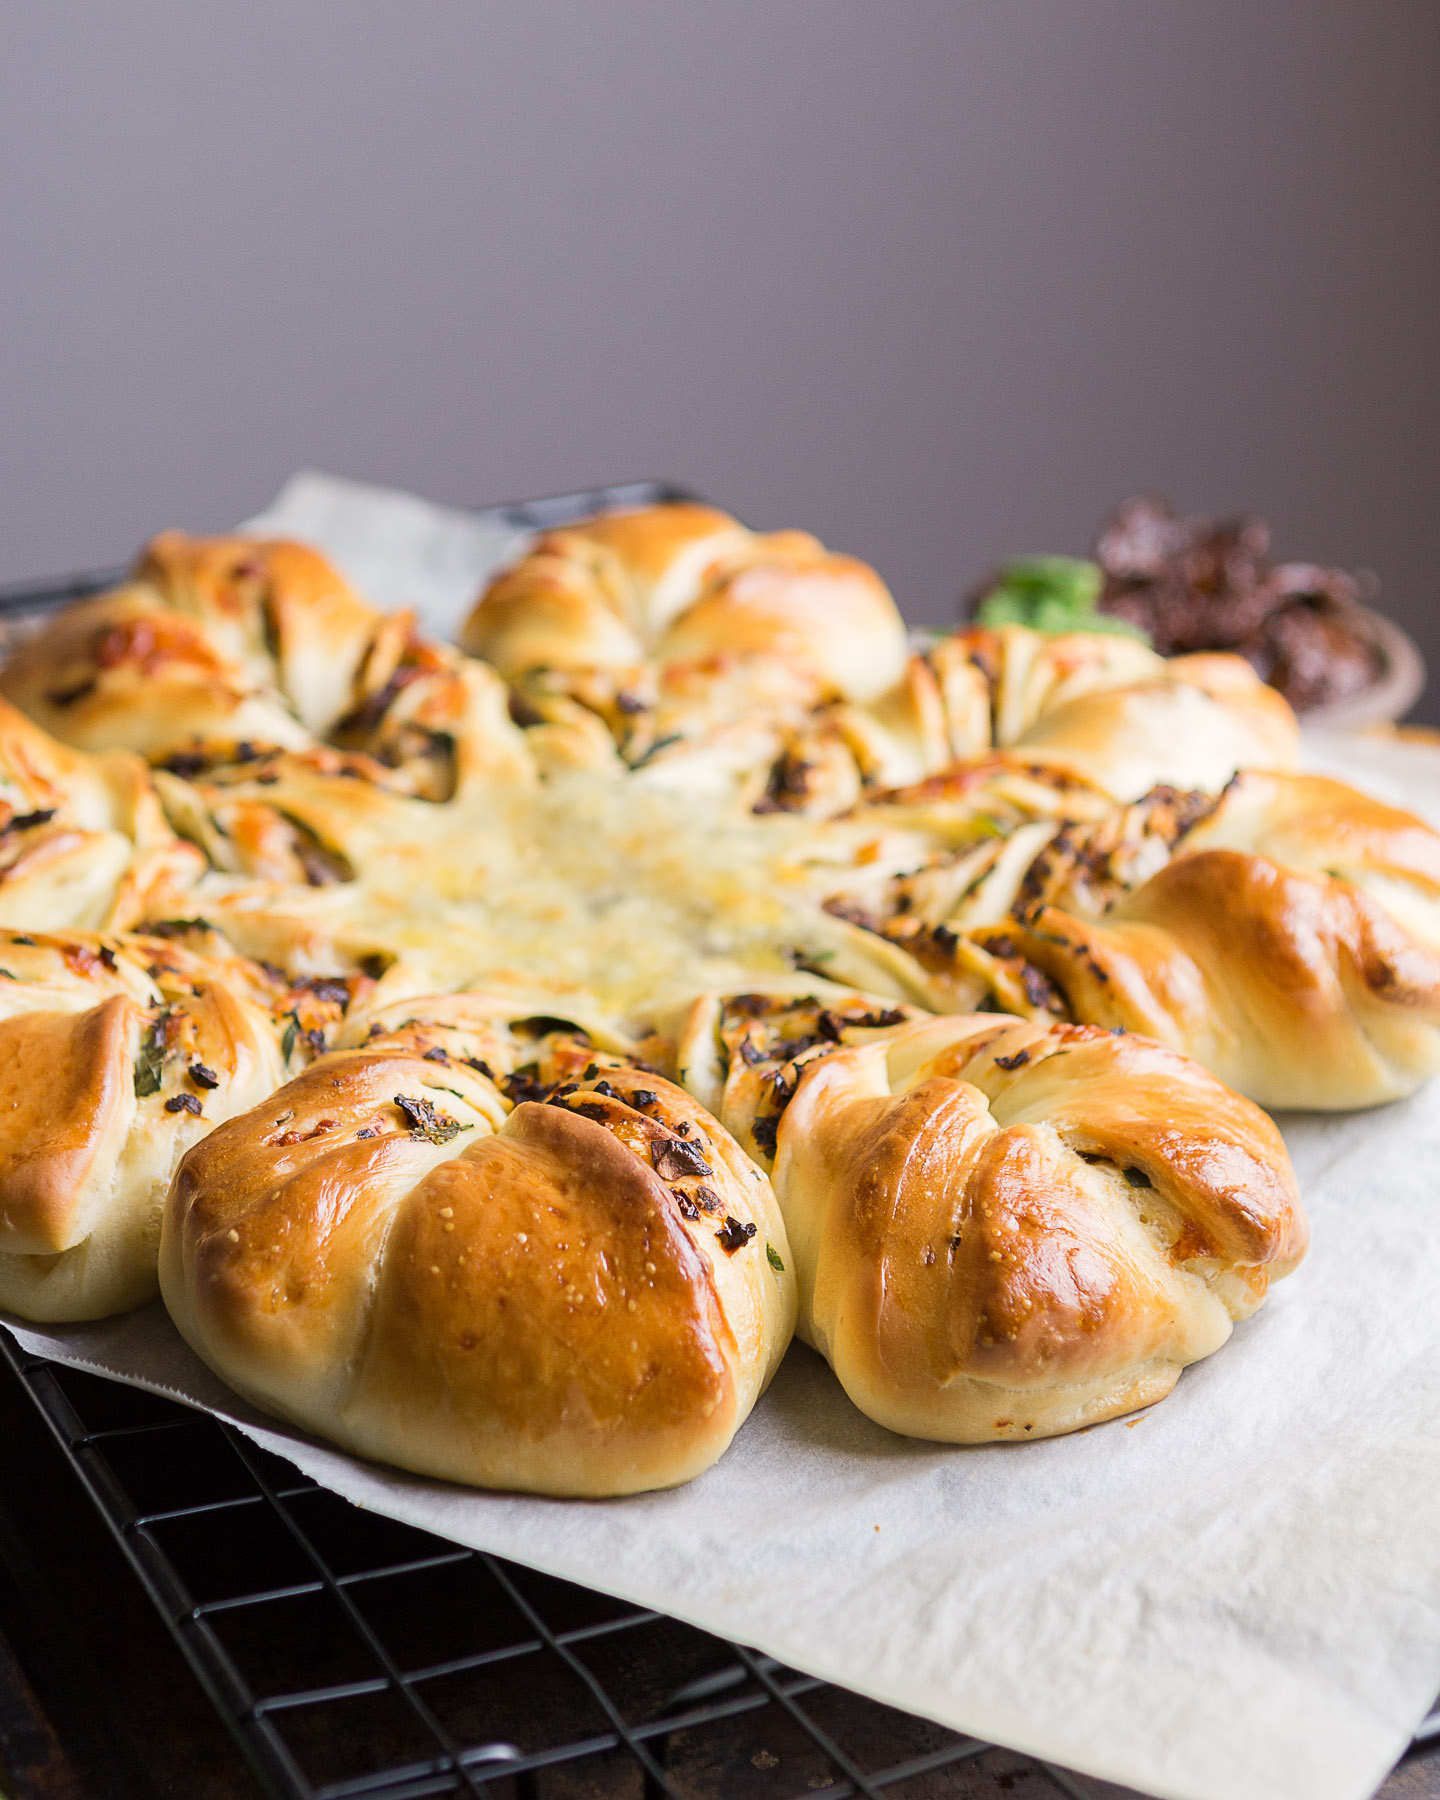 sudried-tomato-basil-star-bread-6.jpg